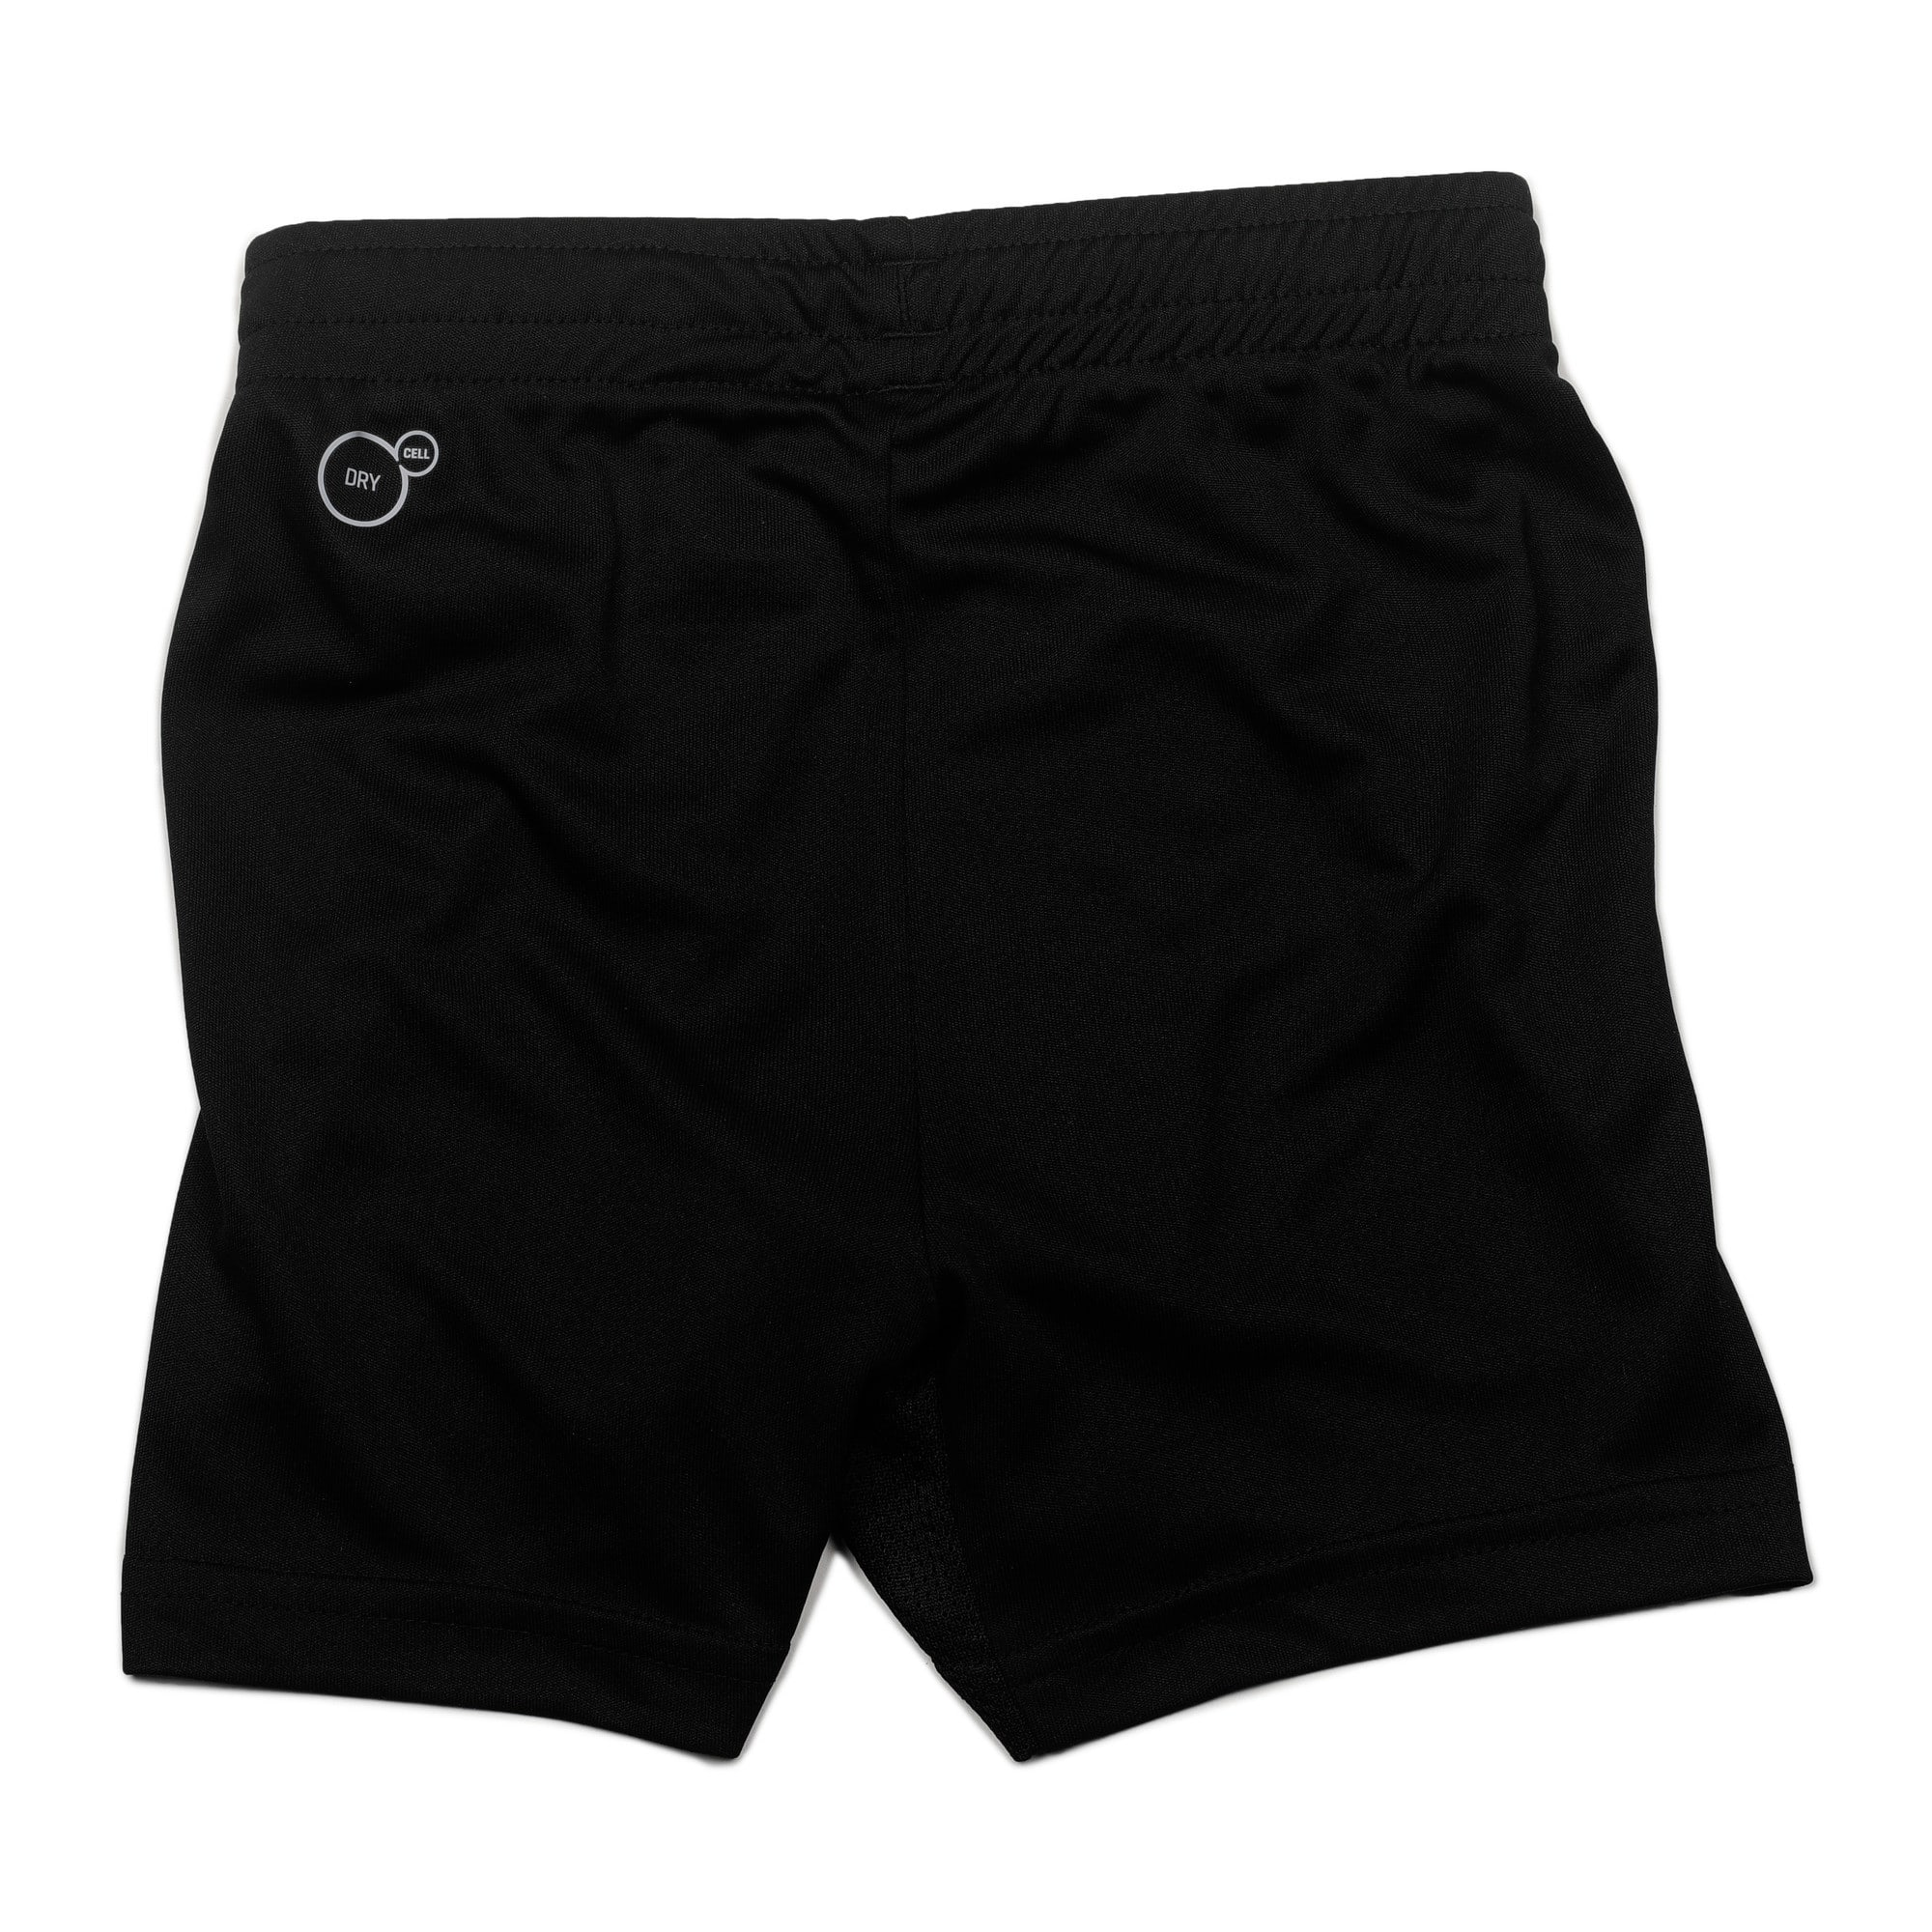 Thumbnail 2 of ftblTRG Kids' Football Training Shorts, Puma Black-Puma White, medium-IND